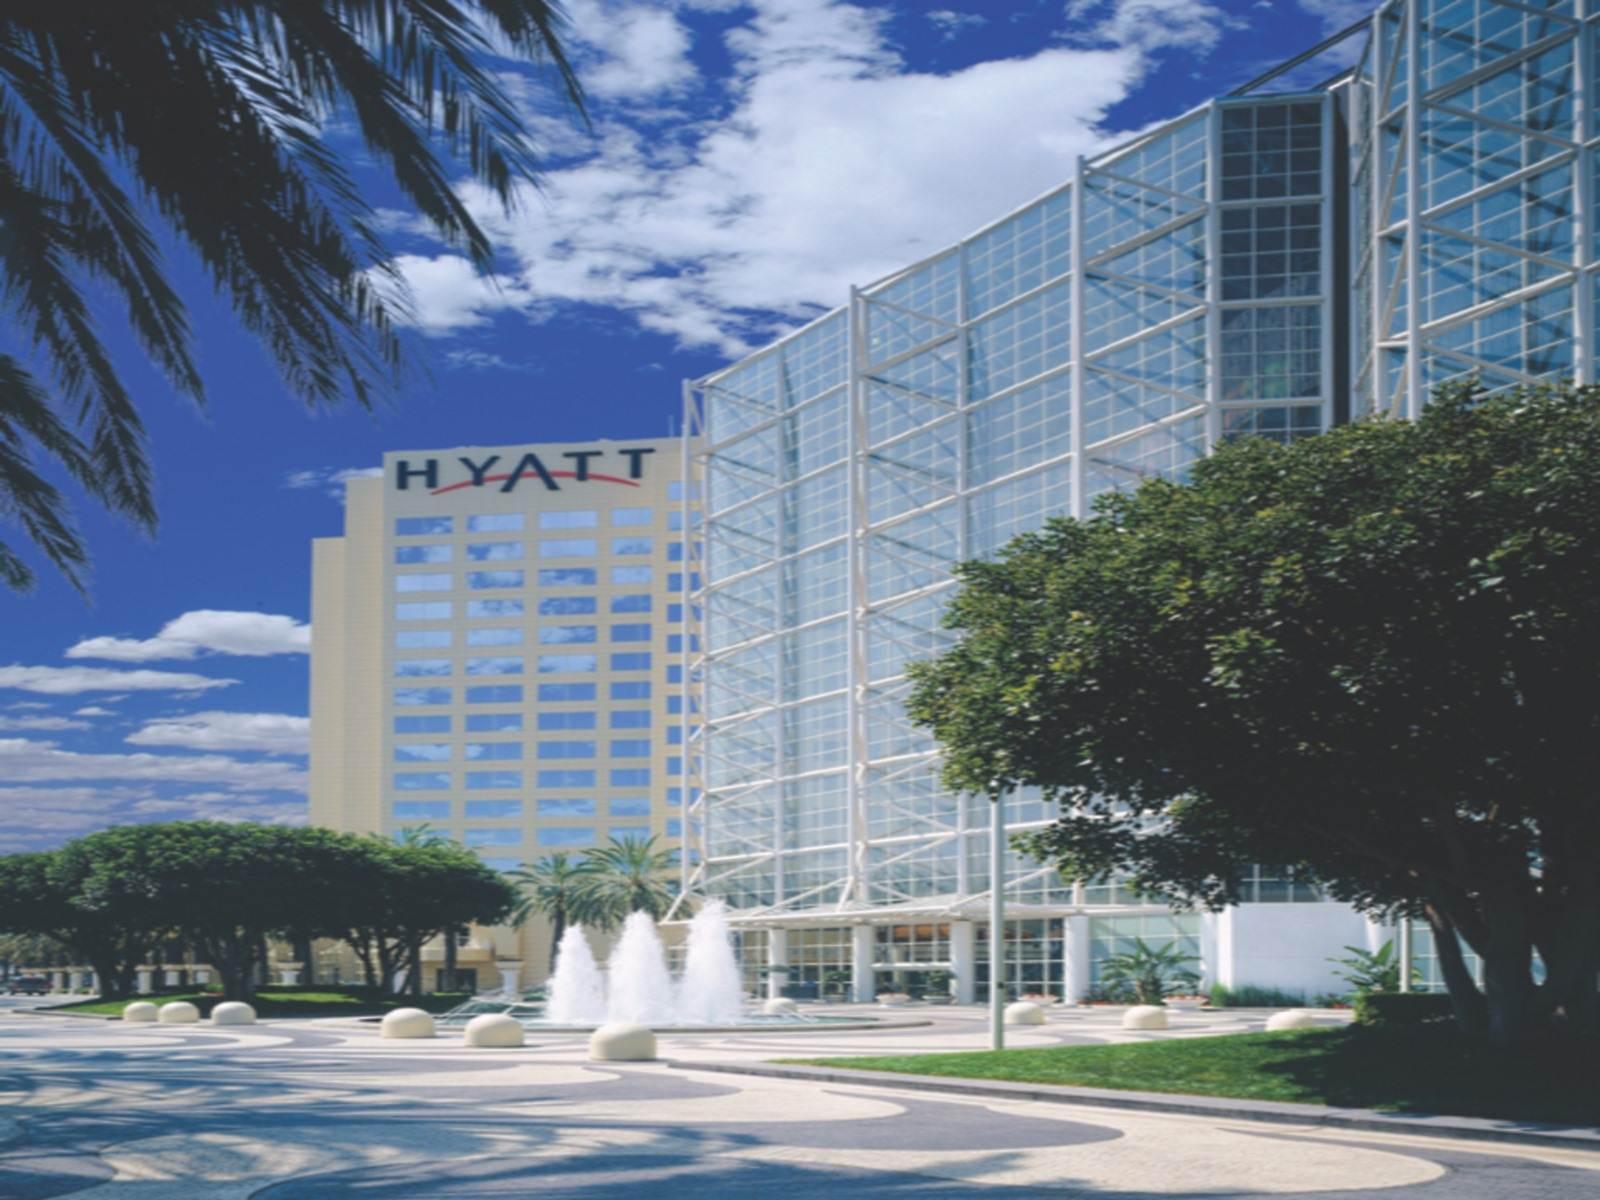 Hyatt Regency Orange County Hotel